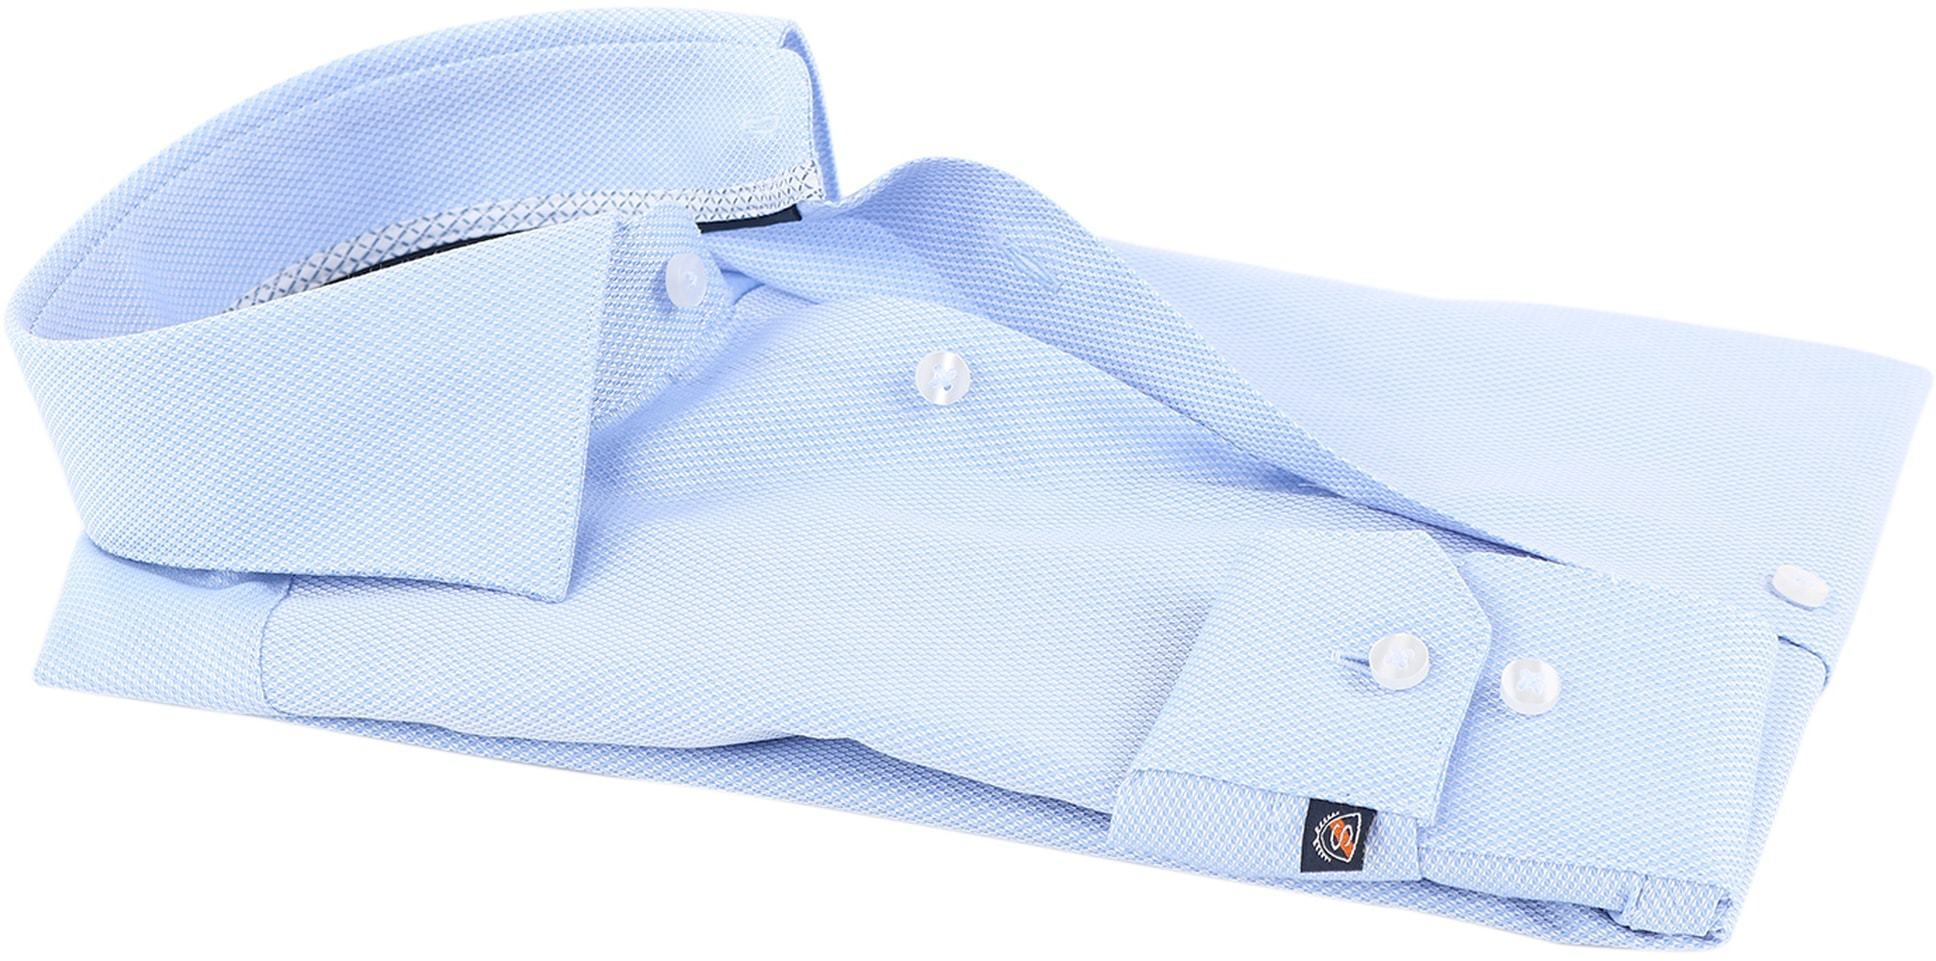 Suitable Overhemd Blue Dessin D71-16 foto 2